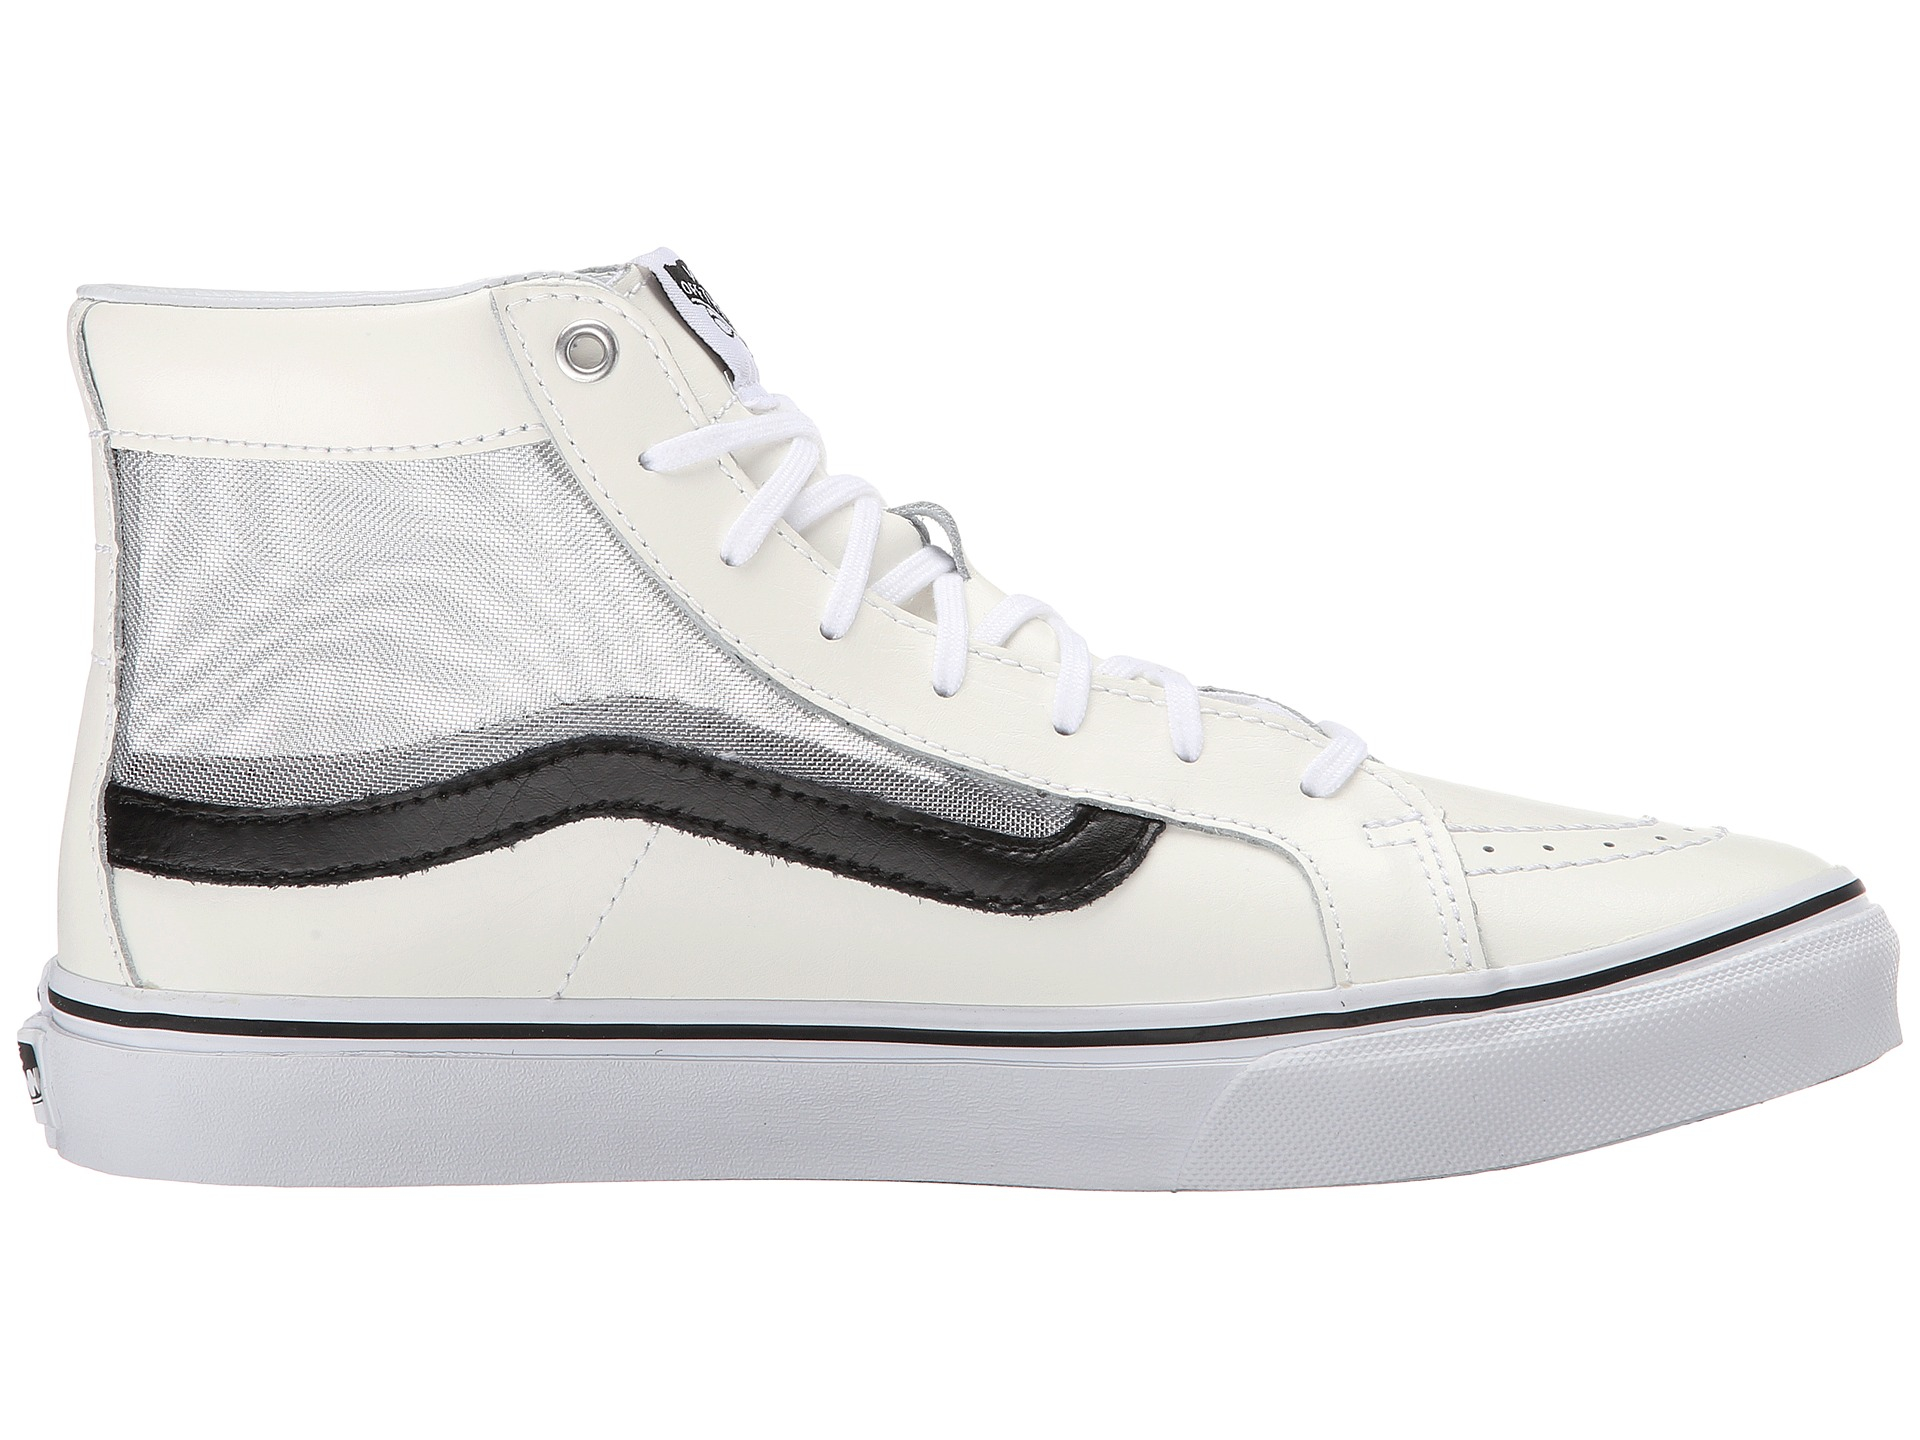 e23bee7d4a Lyst - Vans Sk8-hi™ Slim Cutout in White